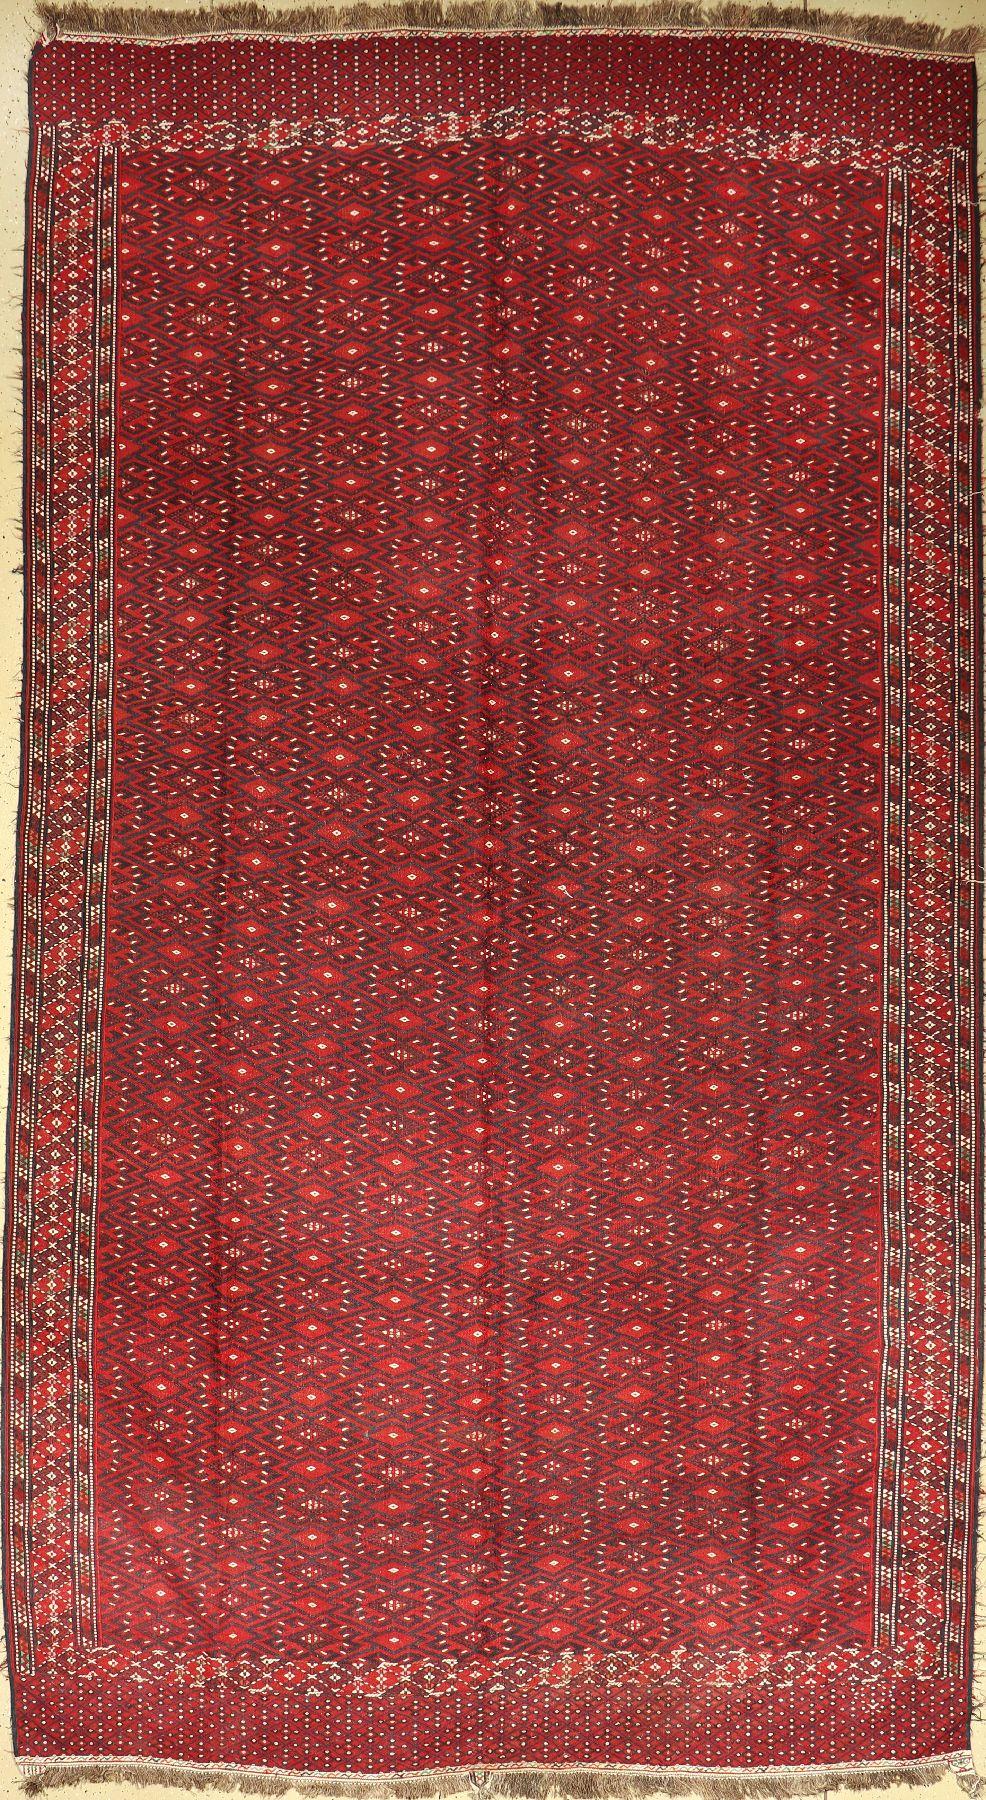 Jomud Palais Kelim, Turkmenistan, um 1920/30, Wolle auf Wolle, EHZ: 2 ca. 380 x 208 cm.Jomud